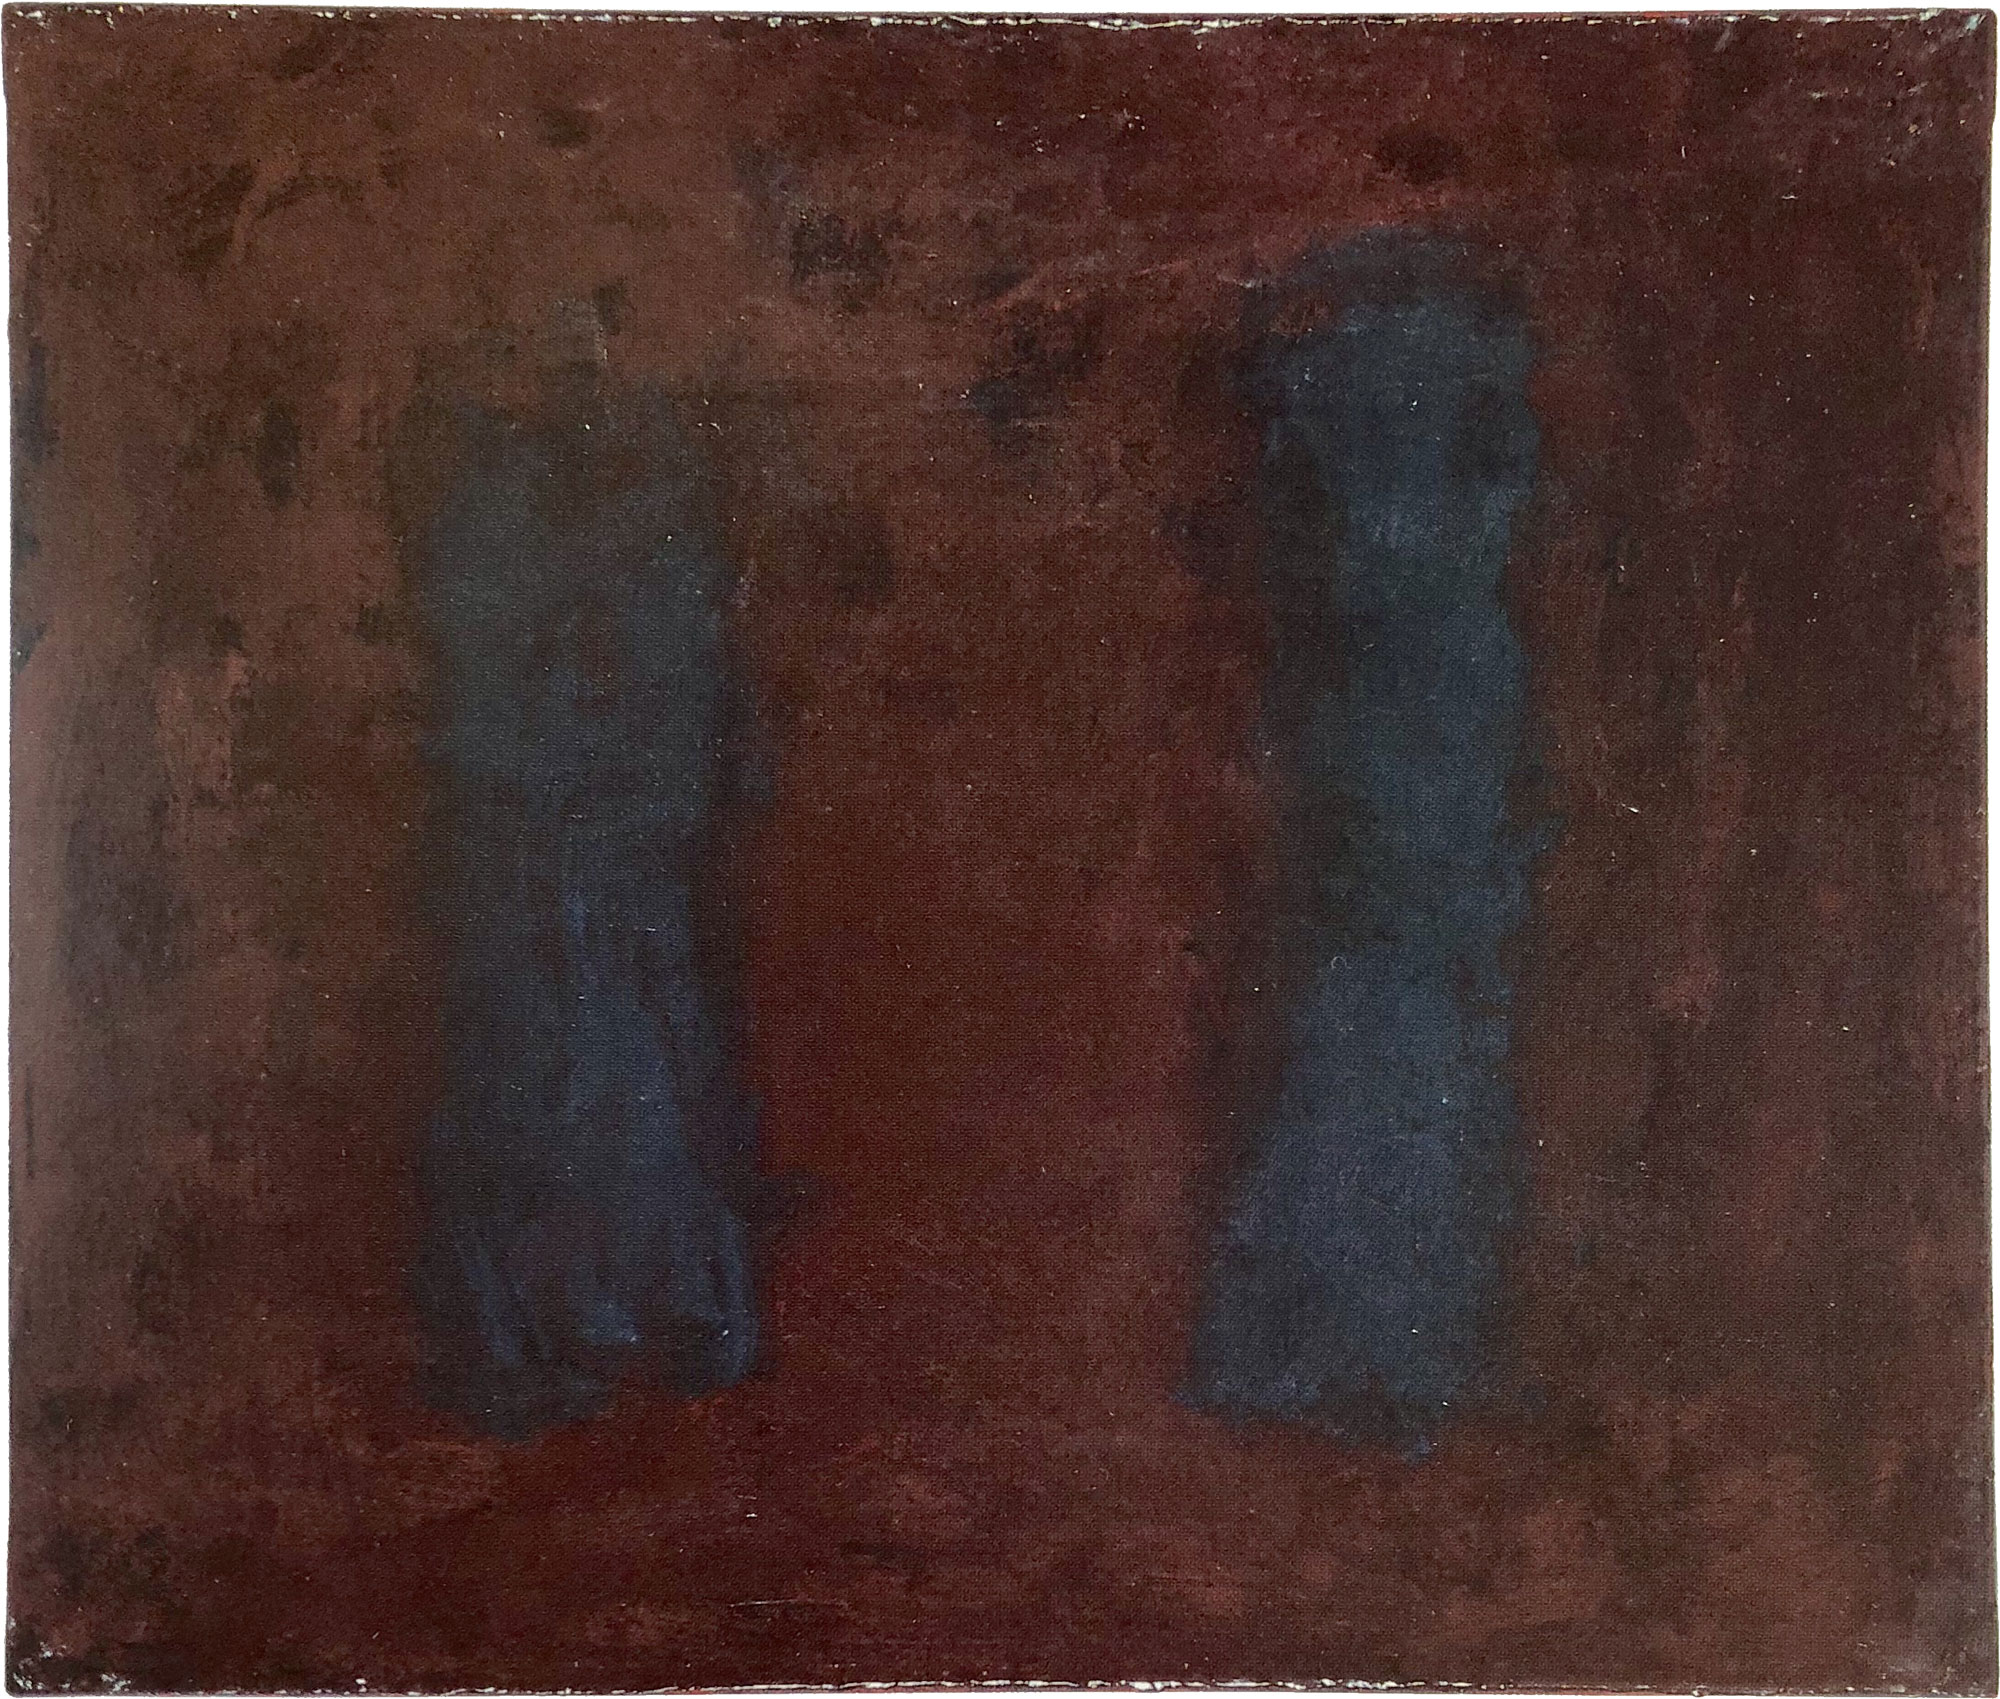 Monochrom-ohne-Titel-6-Öl-auf-Leinwand-80×60-1995